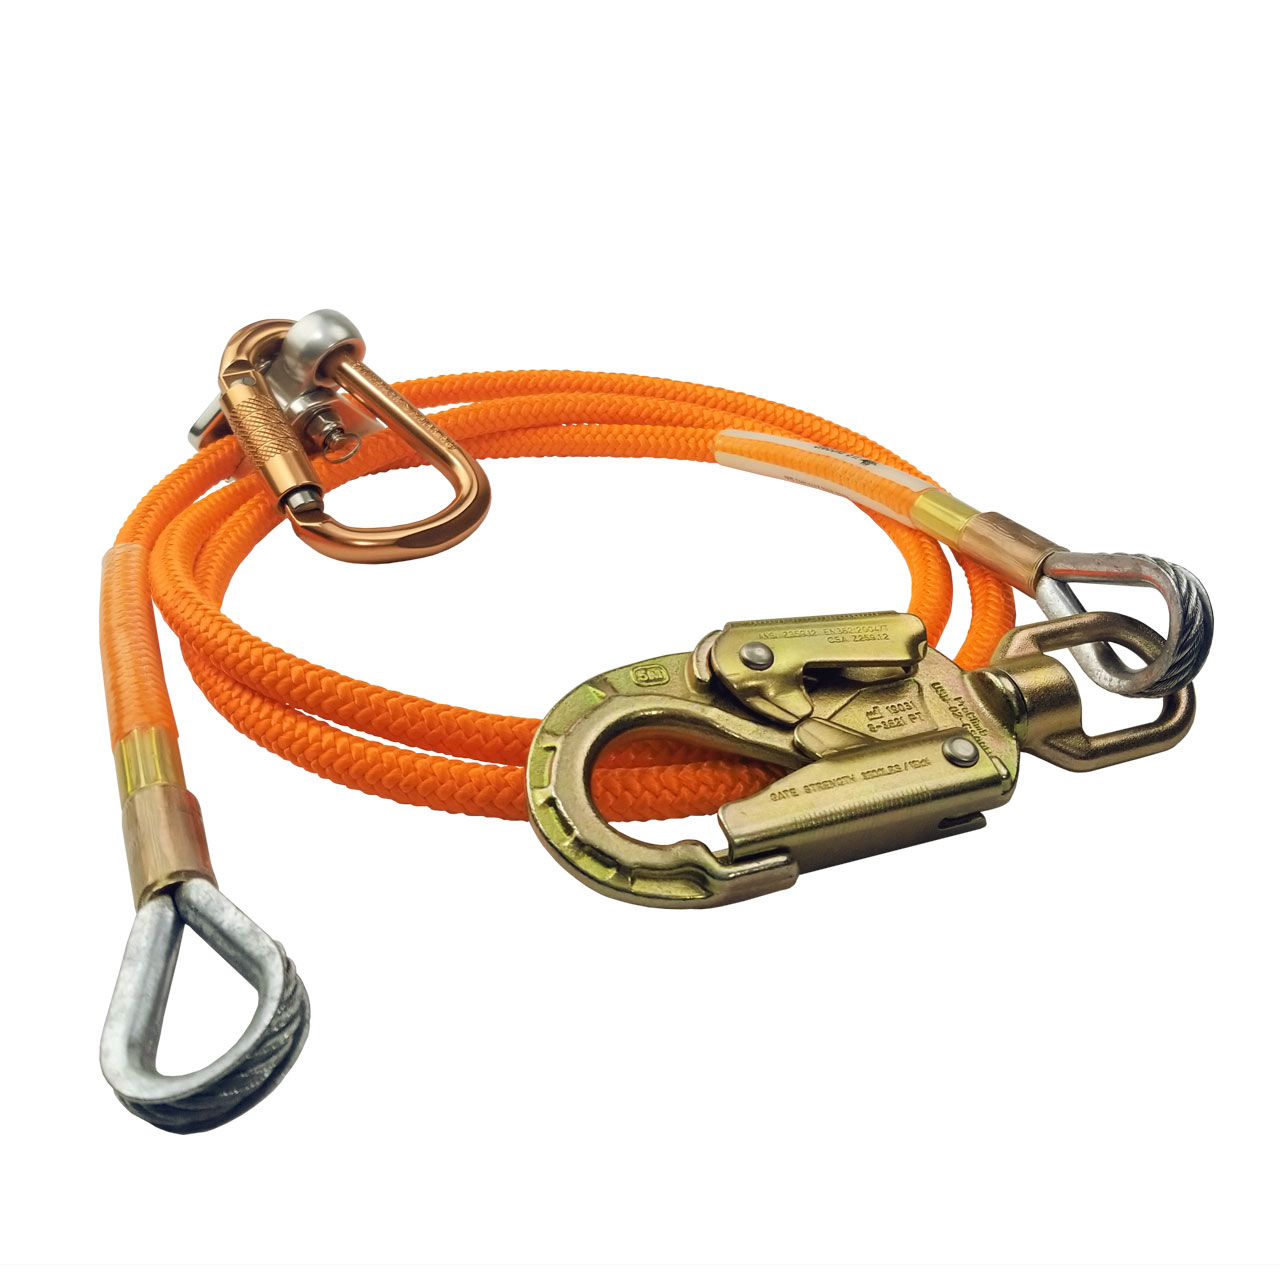 Flipline with Triple Lock Carabiner Adjuster for Fall Protection Low Stretch Arborist Giraffe-X Steel Wire Core Flip Line Kits Adjustable Lanyard 5//8 x 12 Tree Climbers Cut Resistant